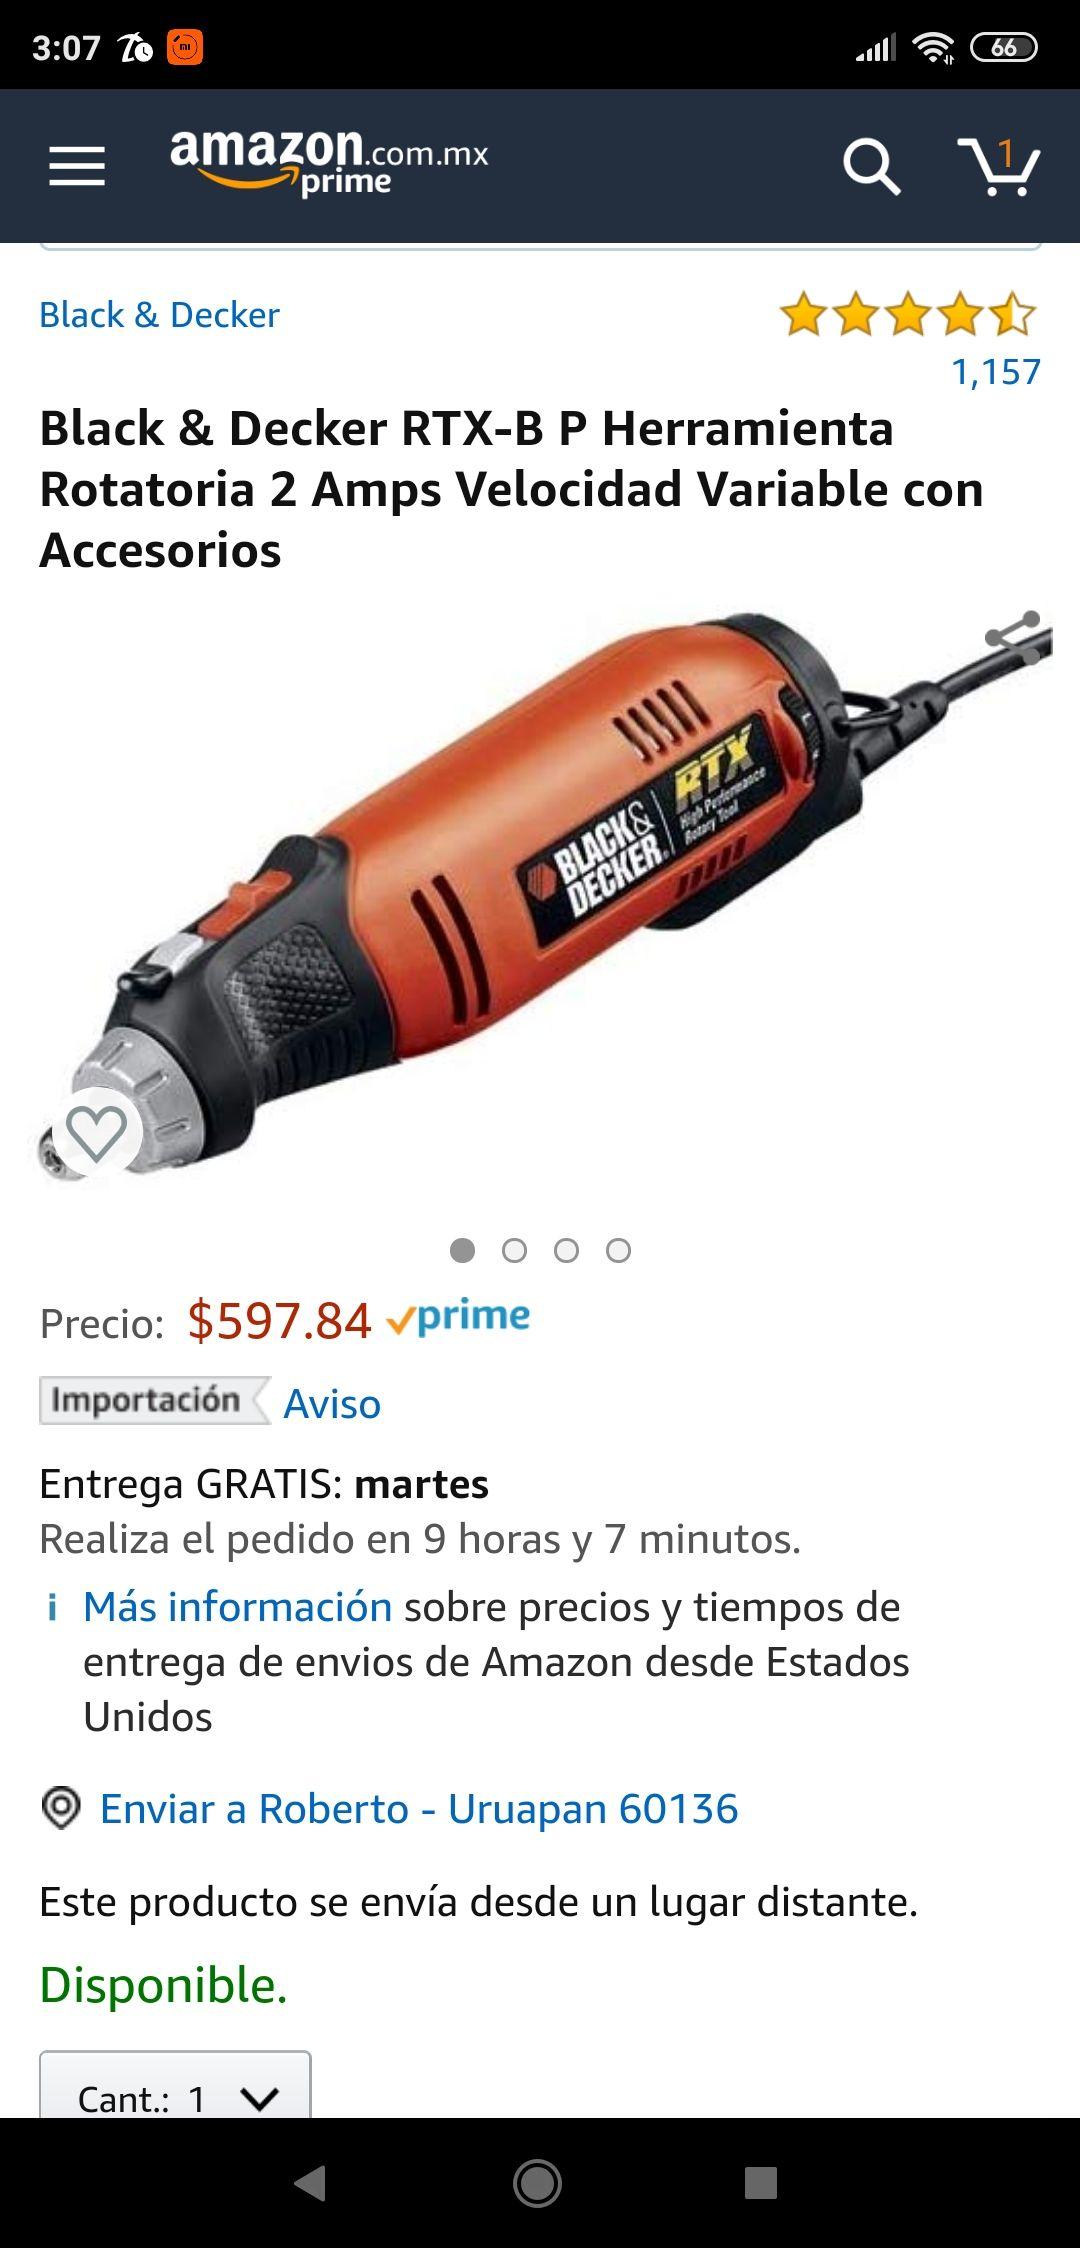 Amazon: Black & Decker RTX-B P Herramienta Rotatoria 2 Amps PRIME